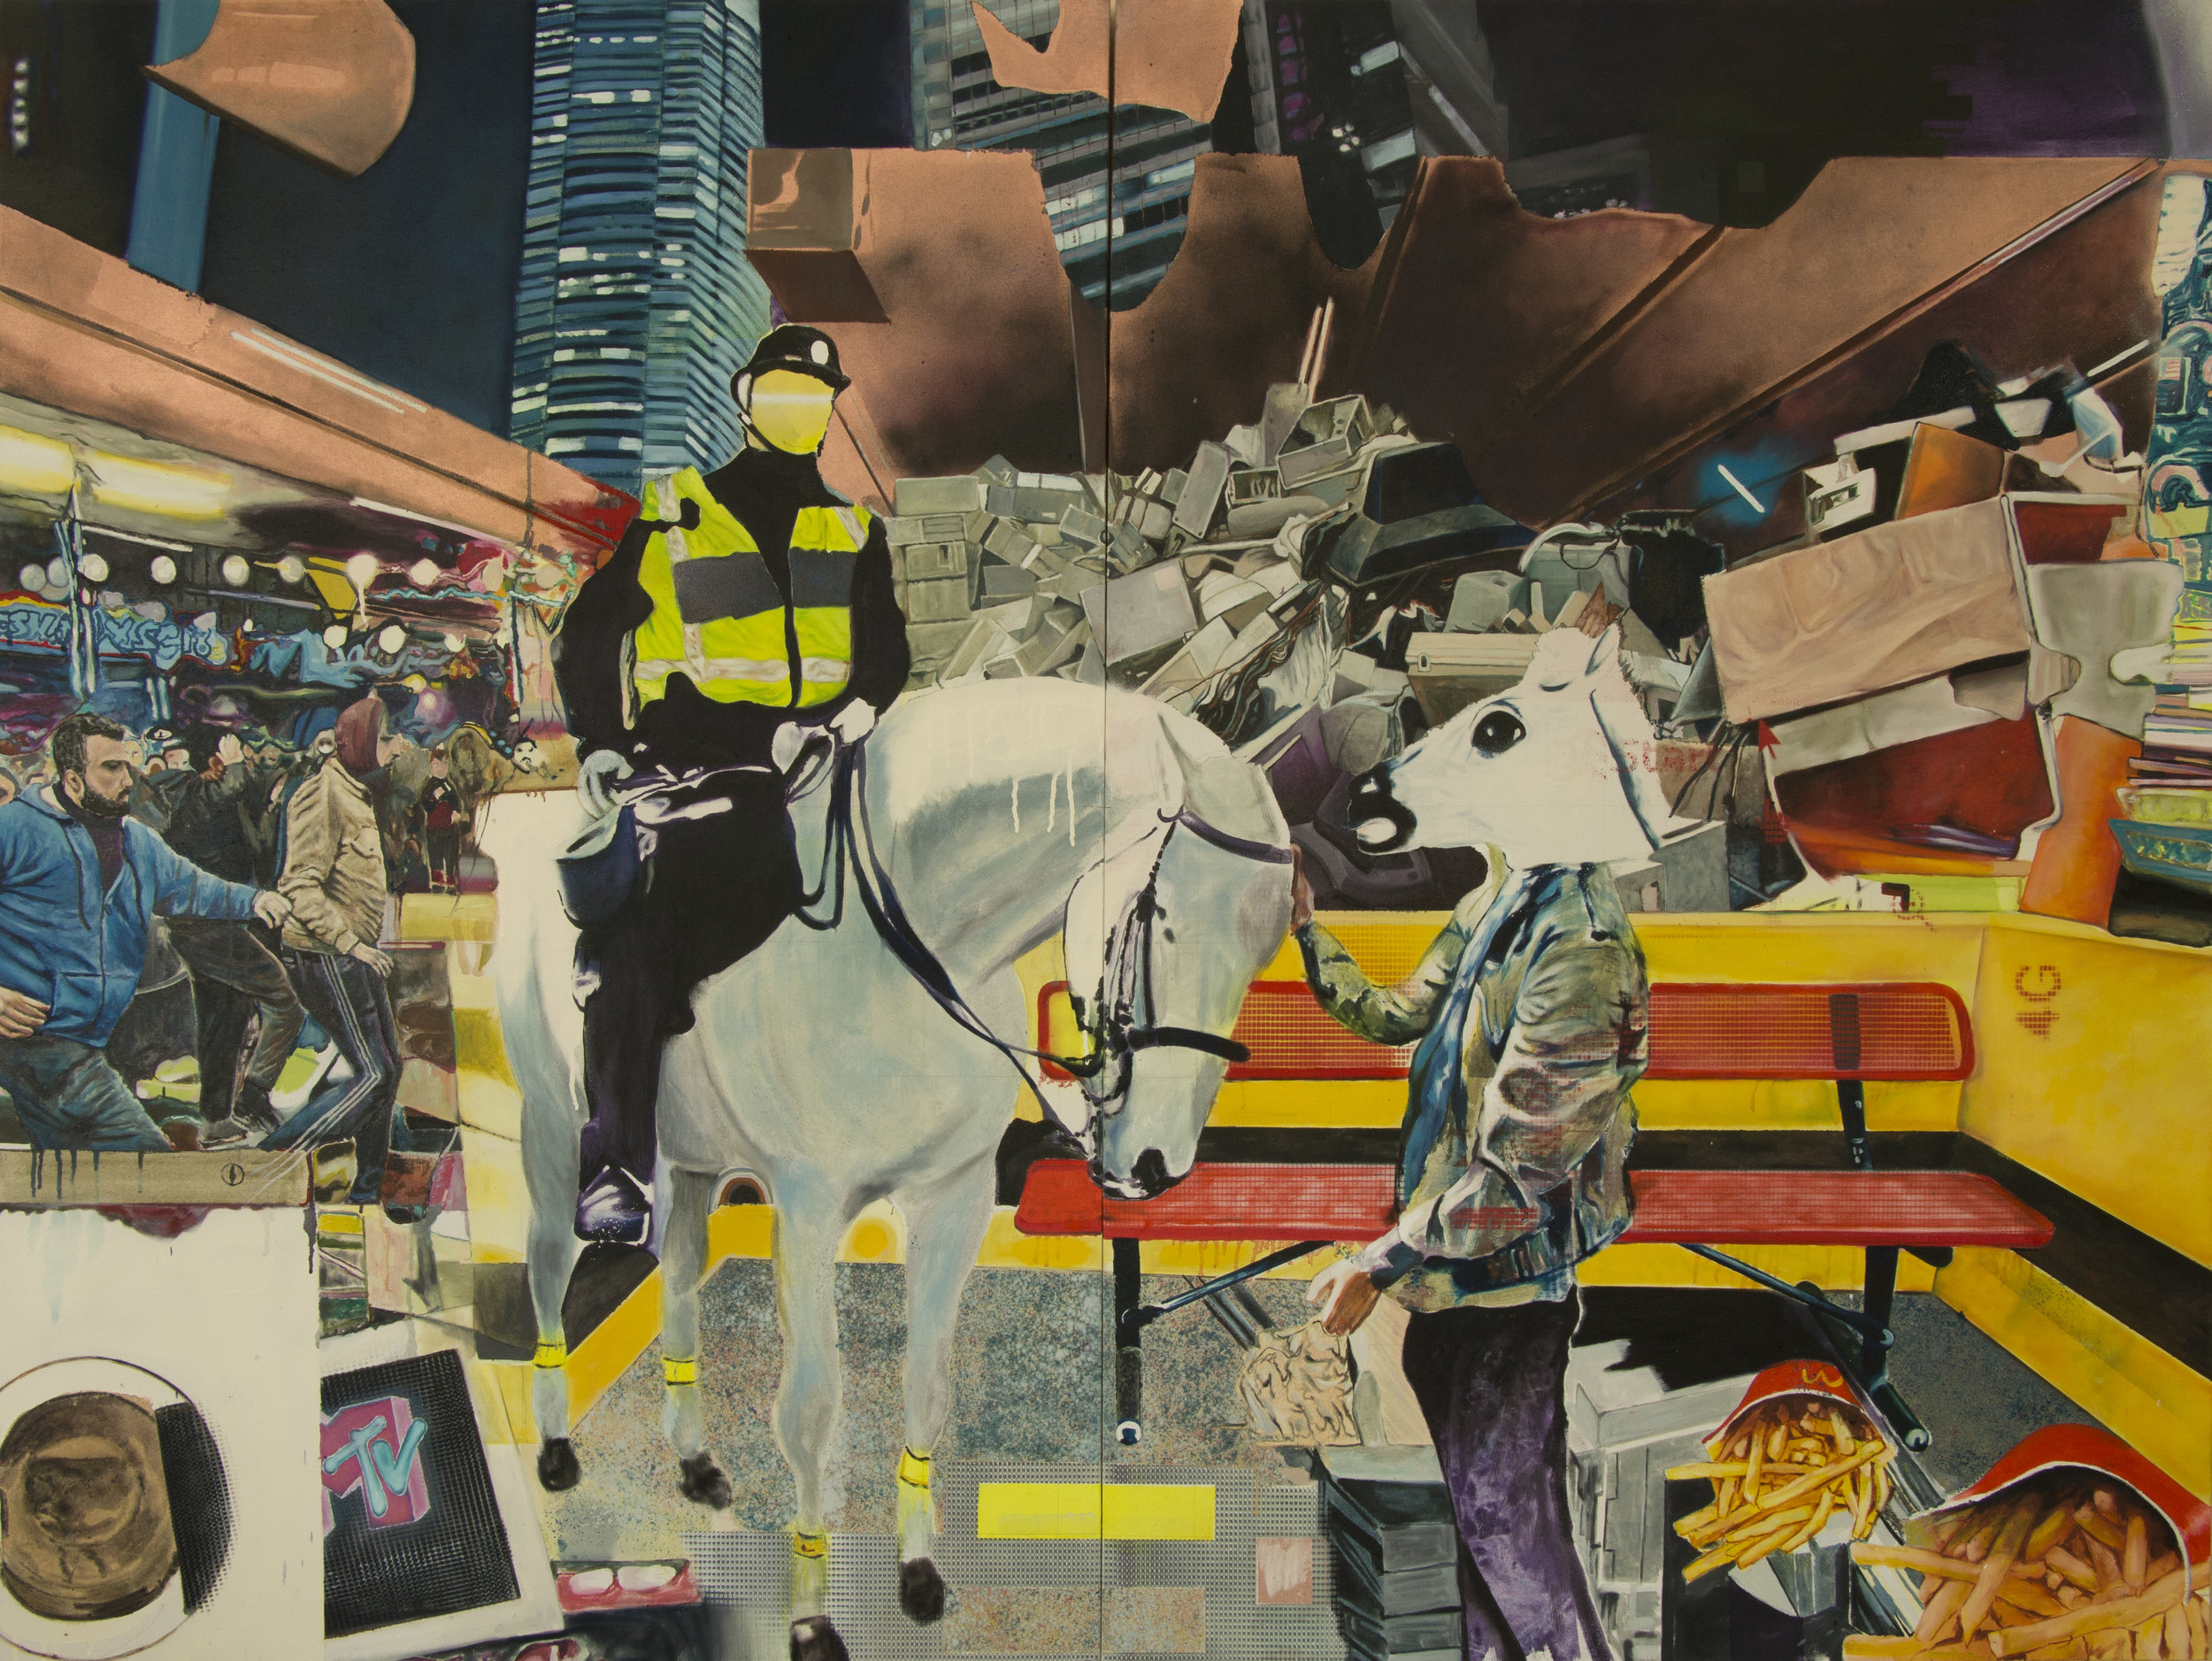 Sam Creasey  Creature Comforts, 2018 Oil on canvas 150 x 200 cm